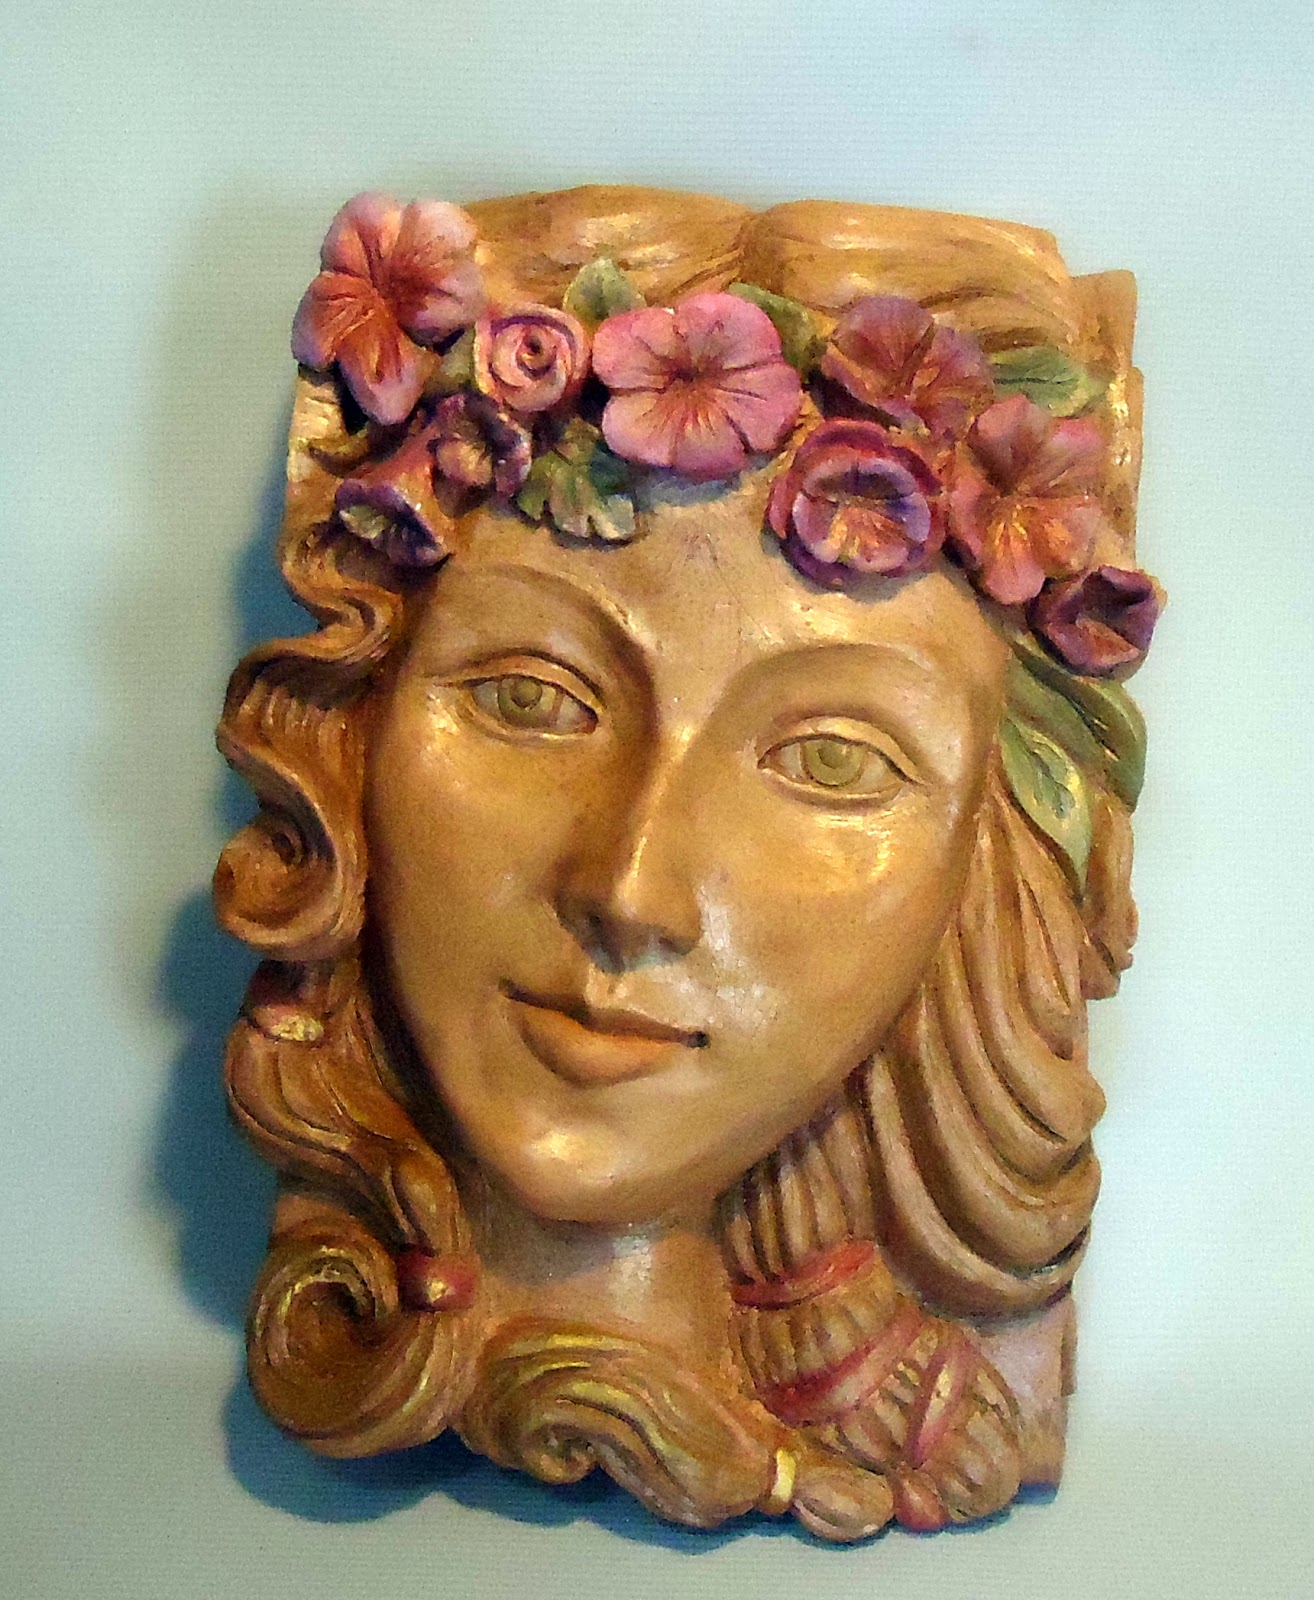 Ariadne, escultura em terracota